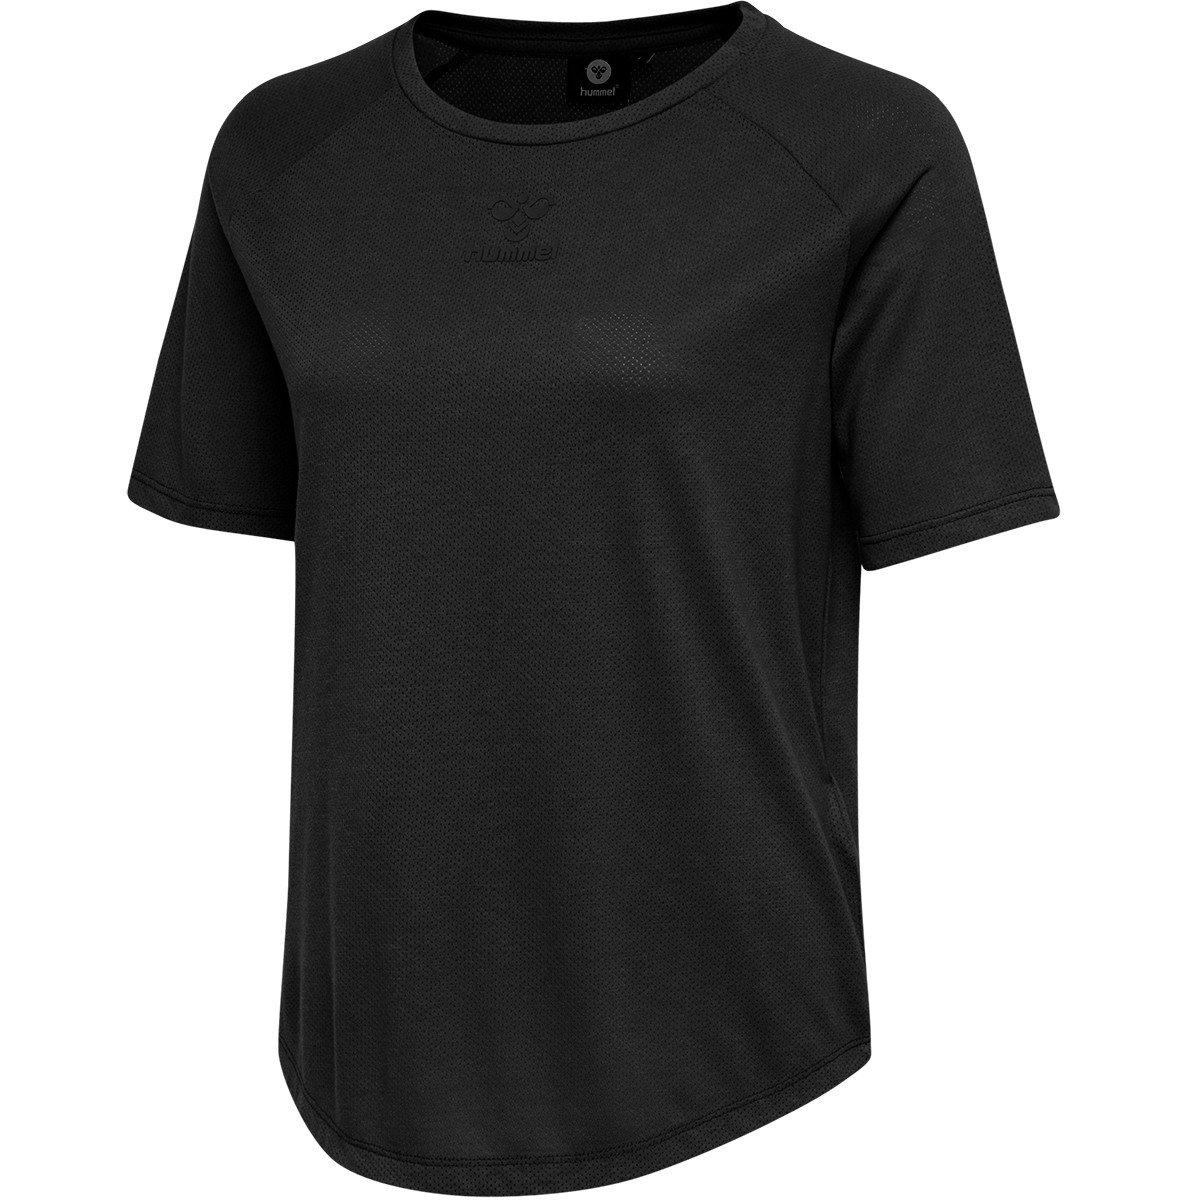 Hummel Vanja T-shirt Dame, sort